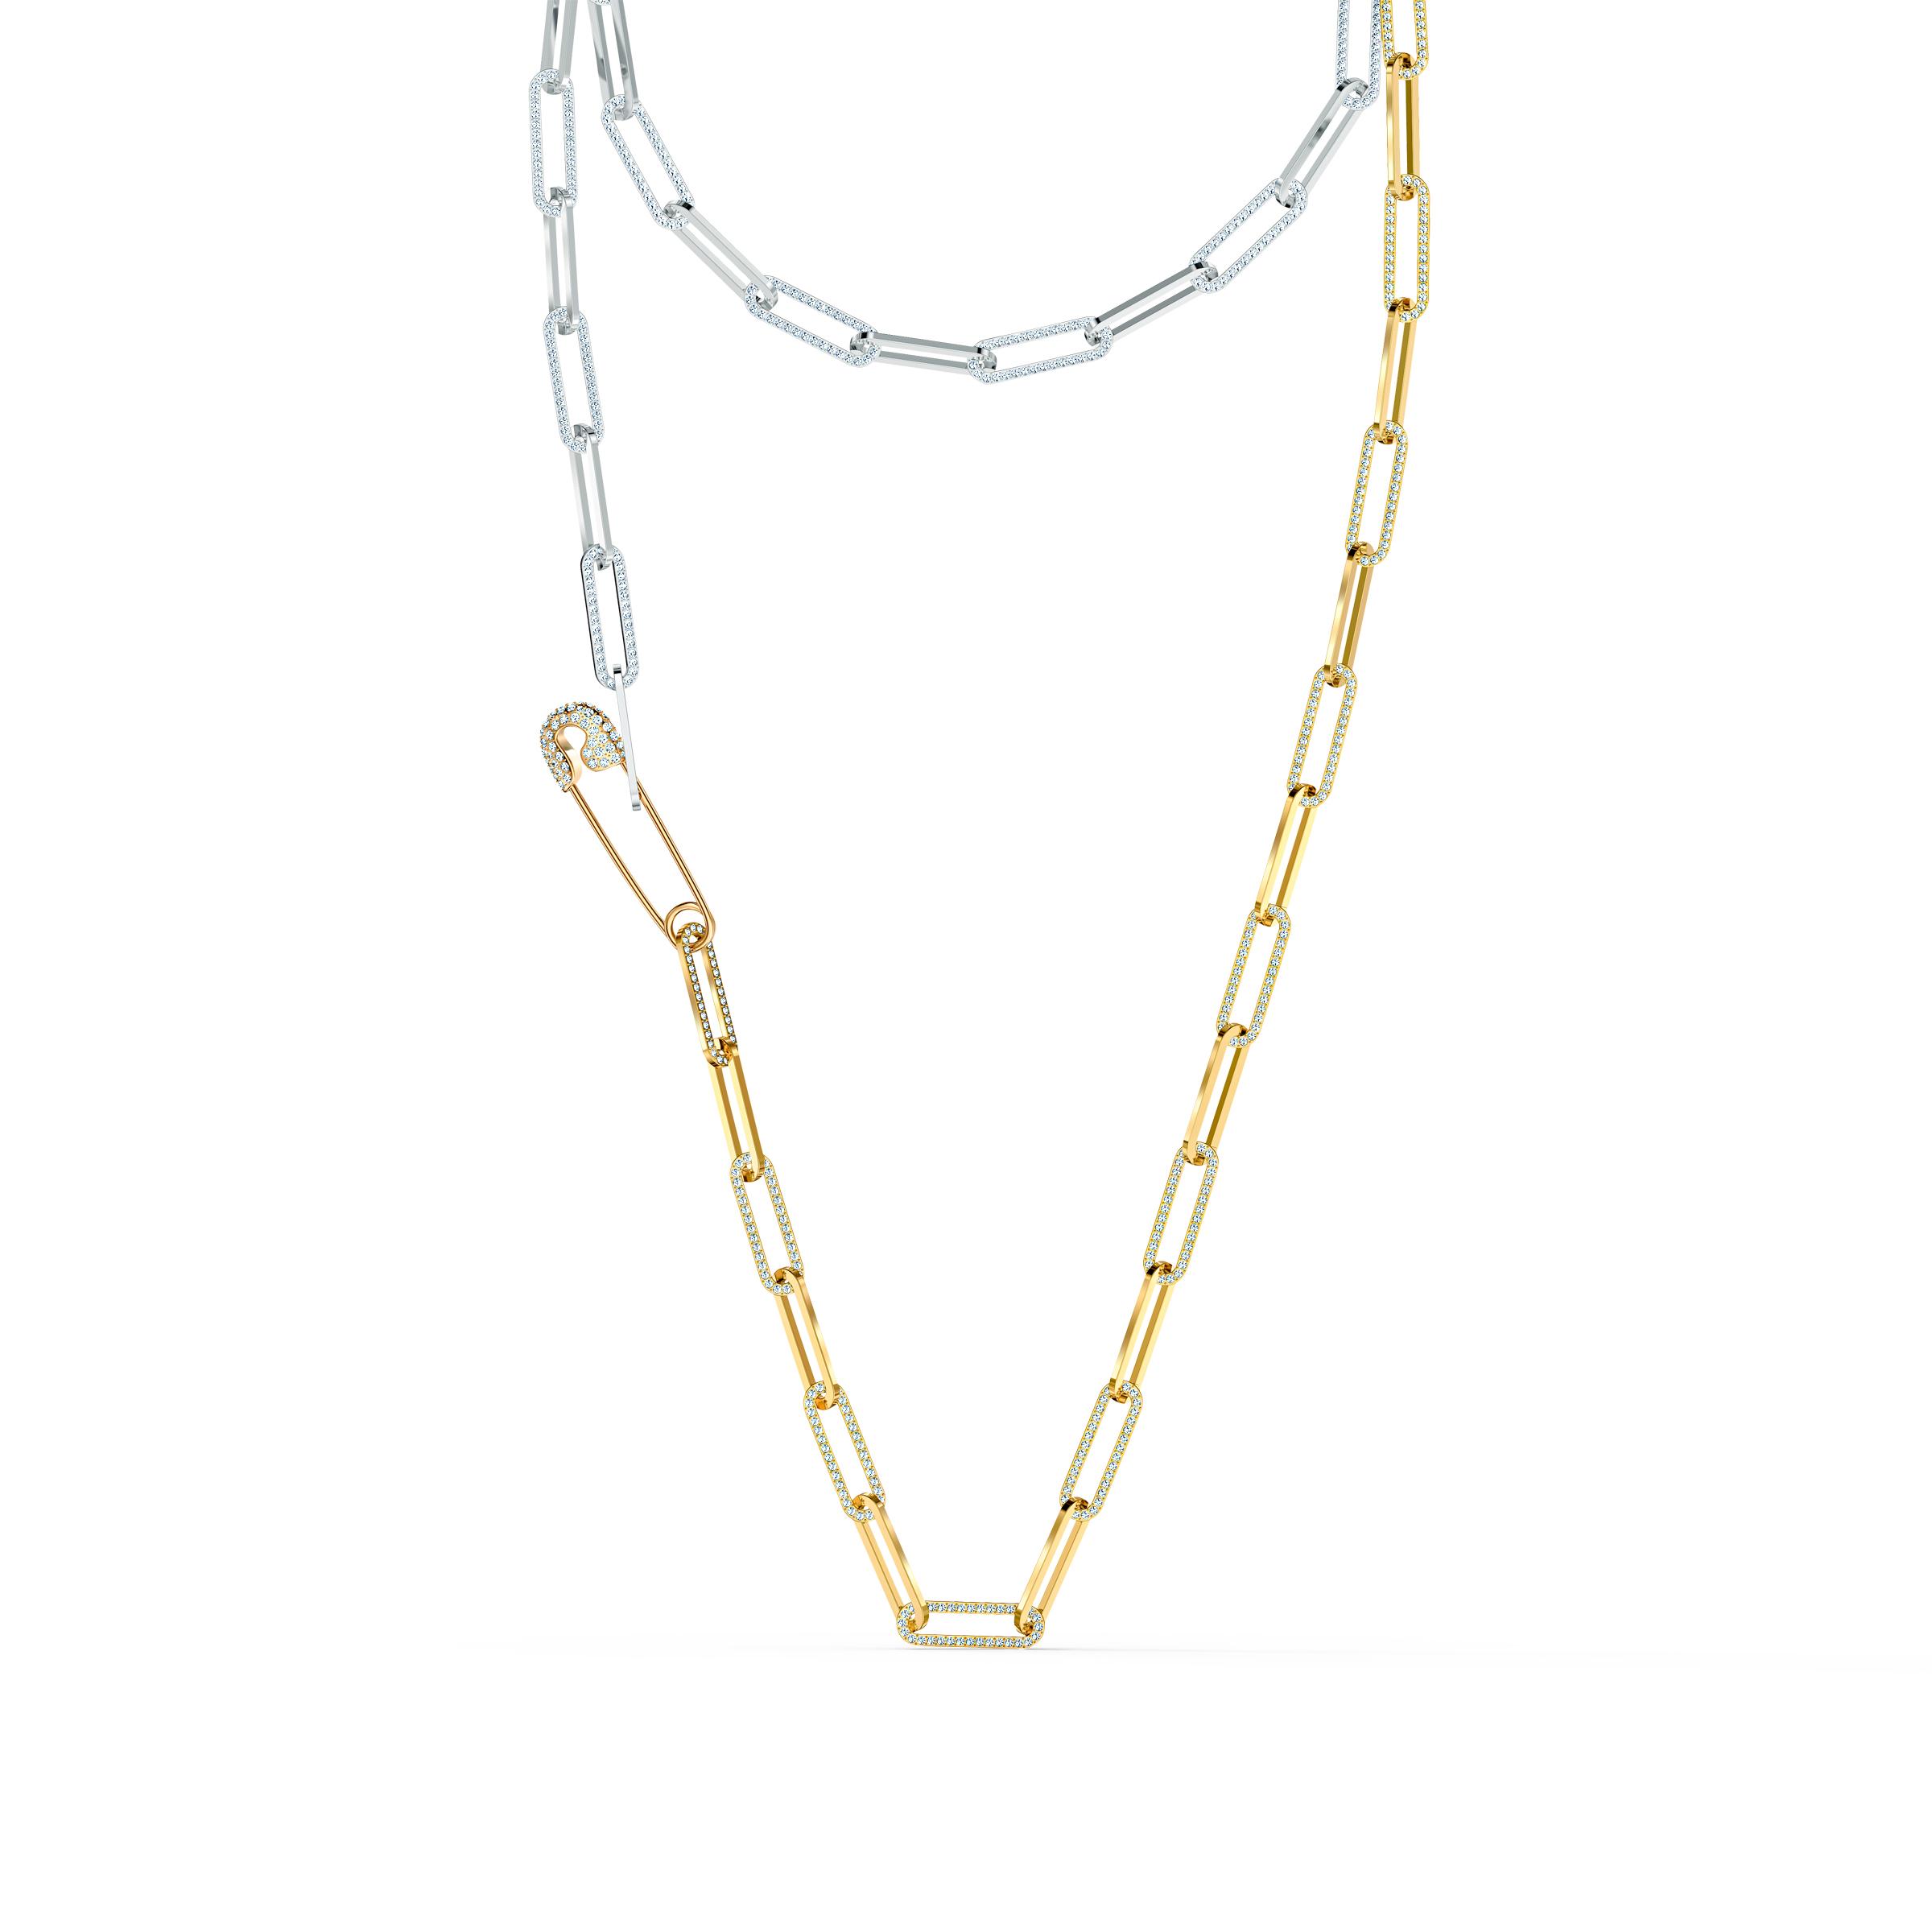 Collier So Cool, blanc, finition mix de métal, Swarovski